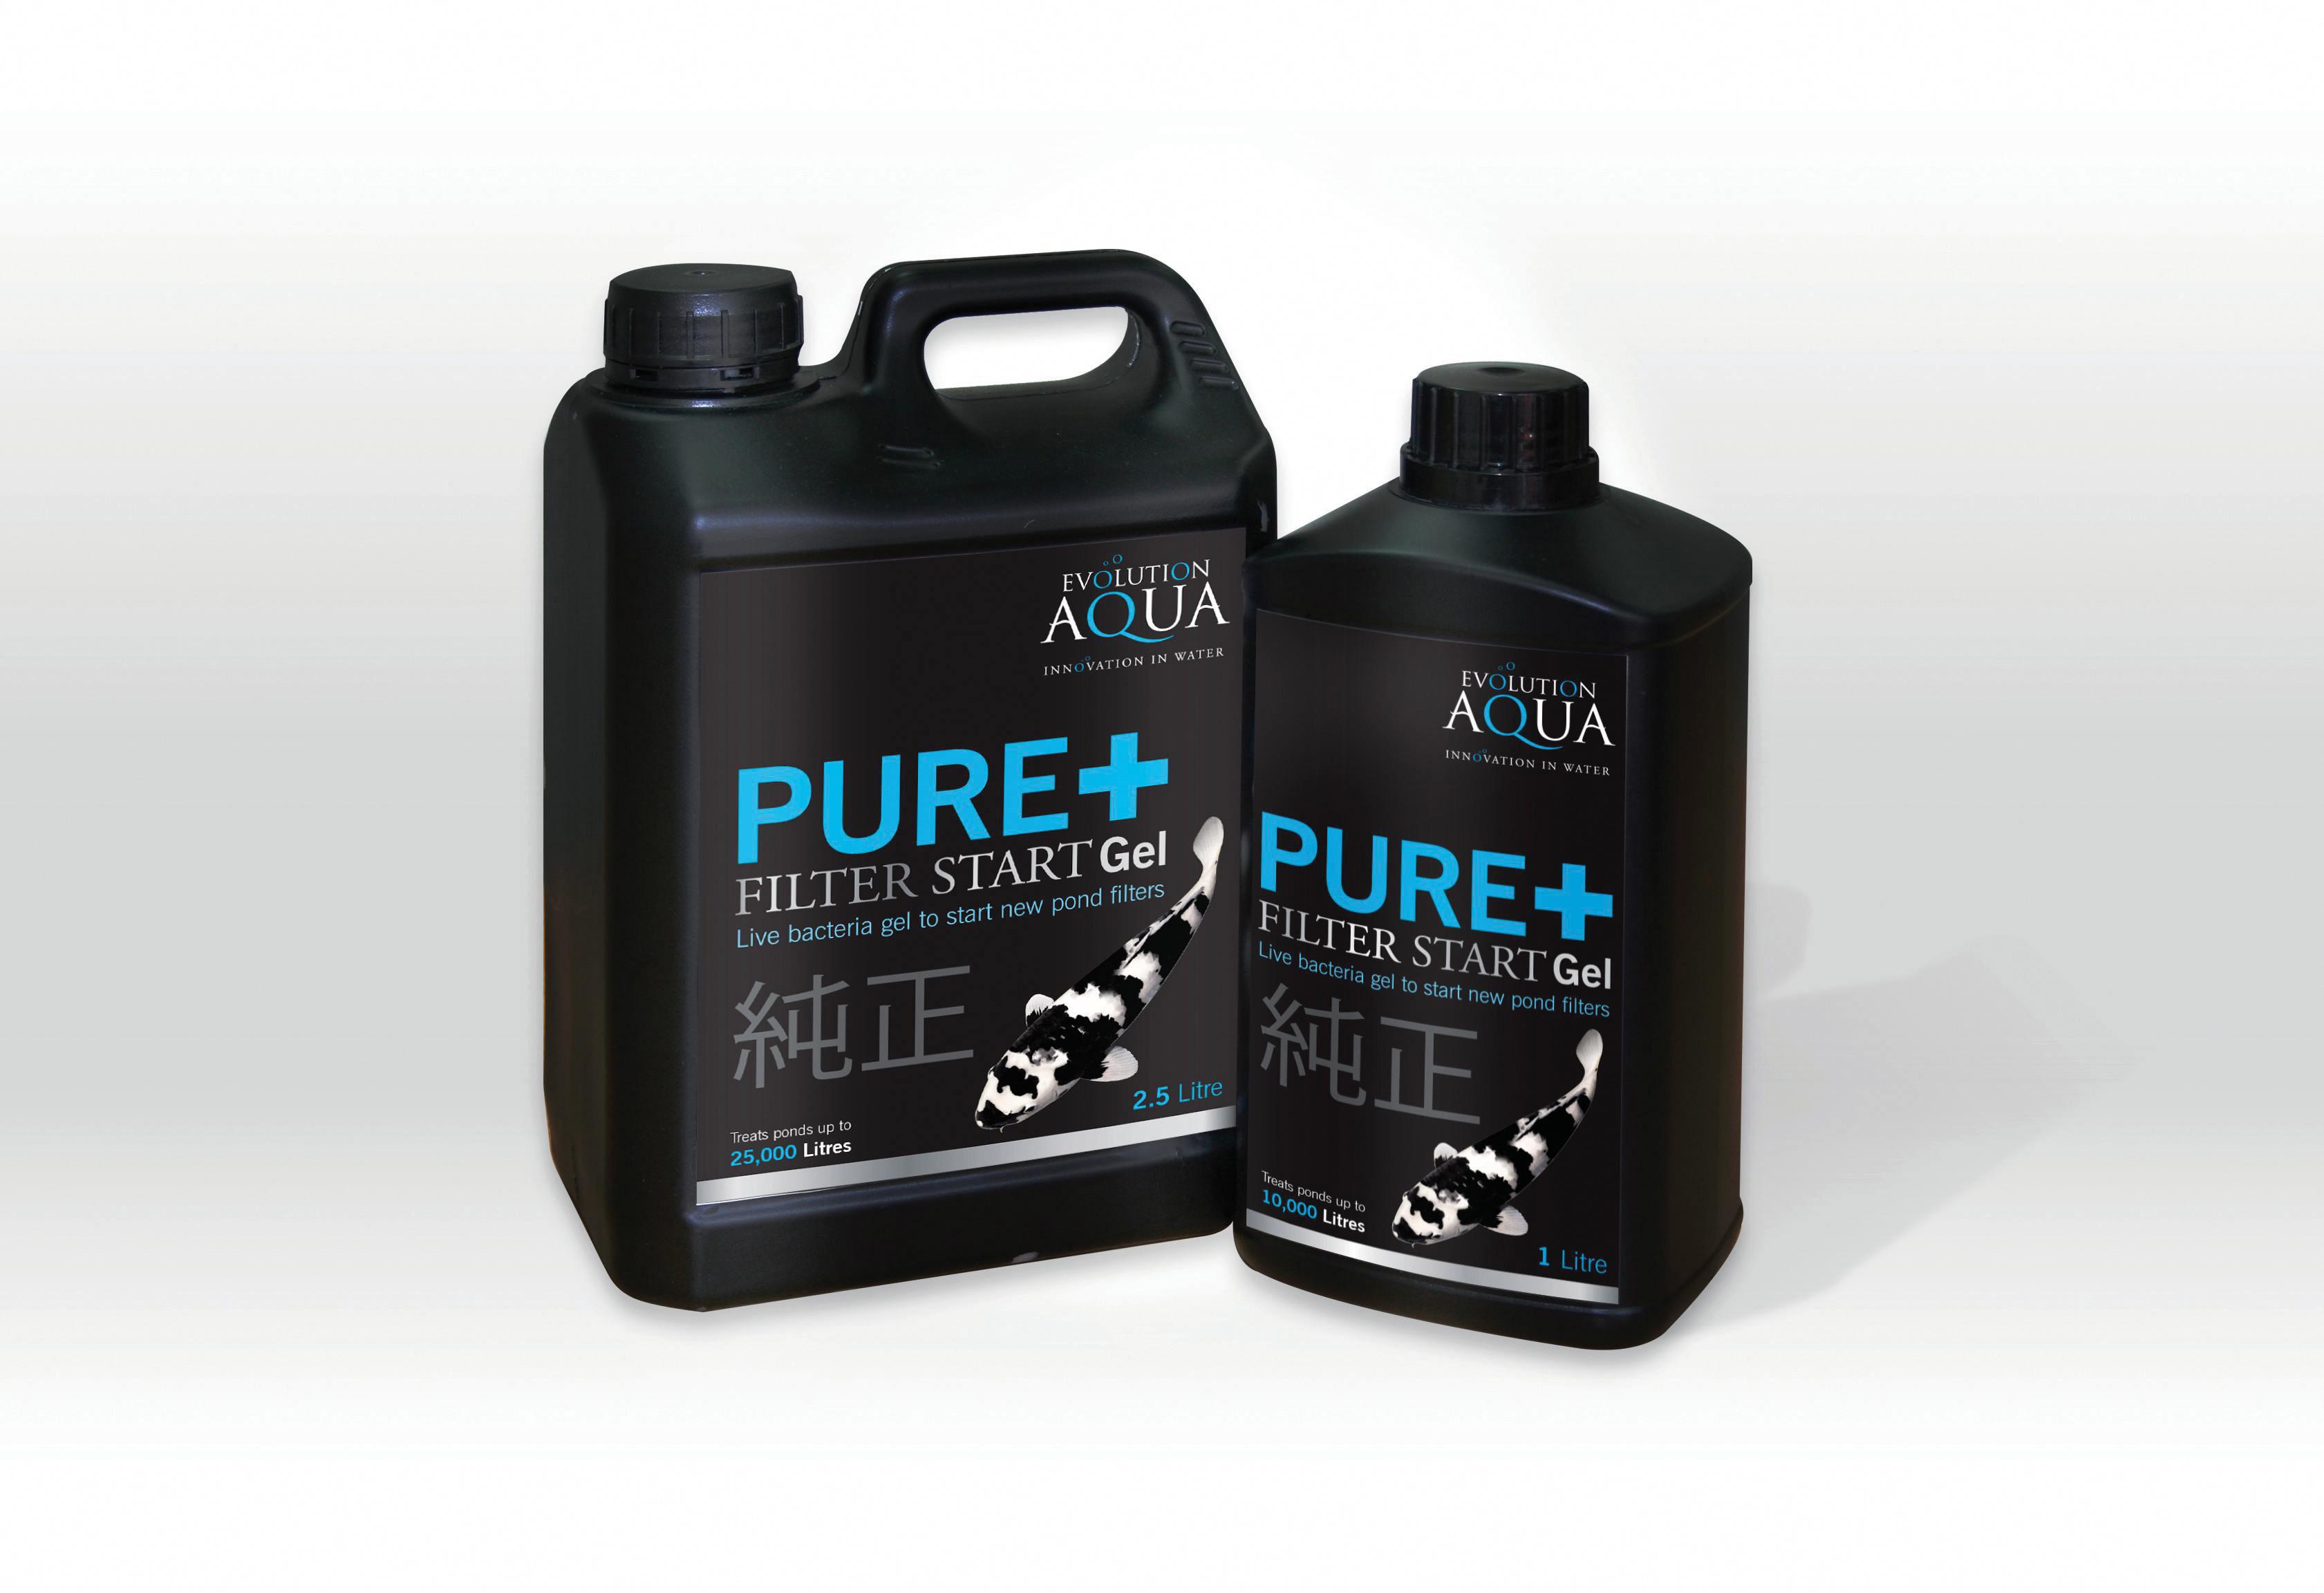 Pure+ Filterstart Gel - 2.5Liter